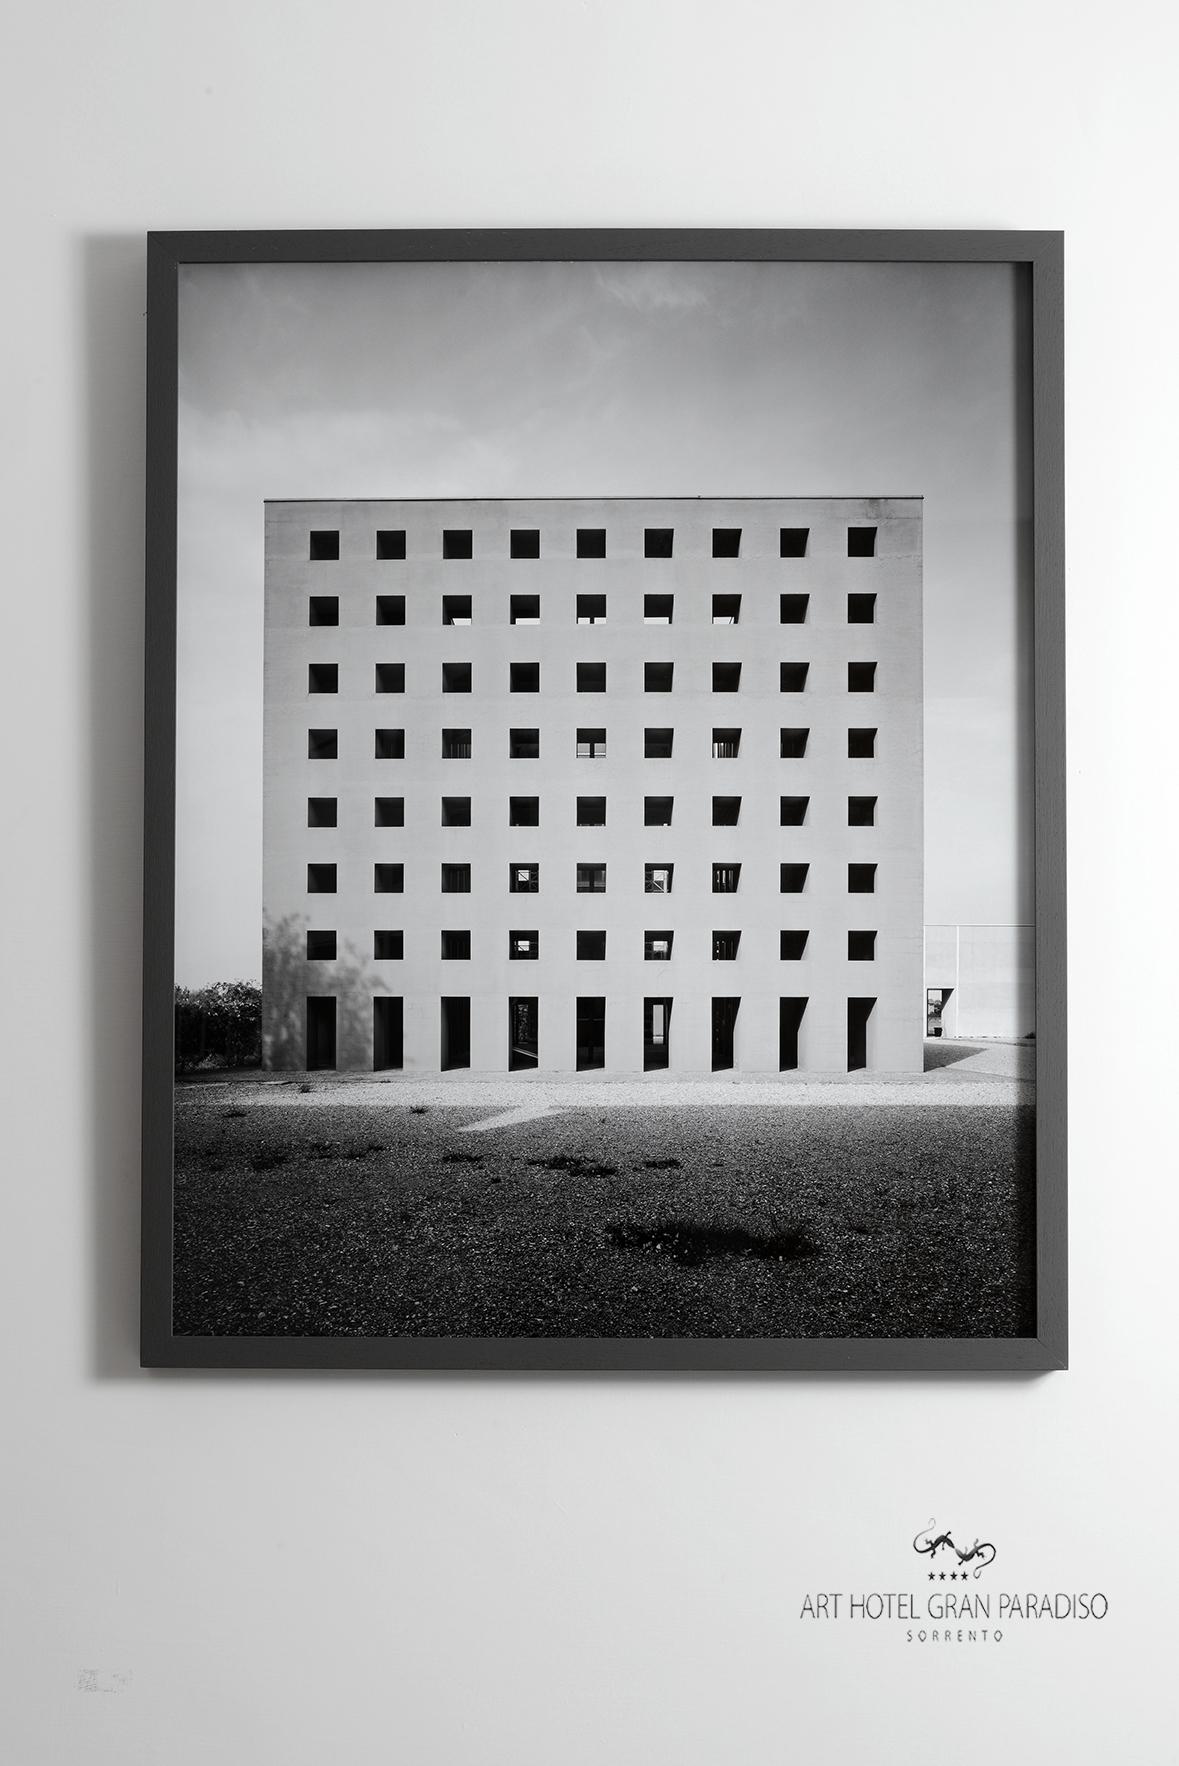 Art_Hotel_Gran_Paradiso_2013_316_Gabriele_Basilico_3.jpg